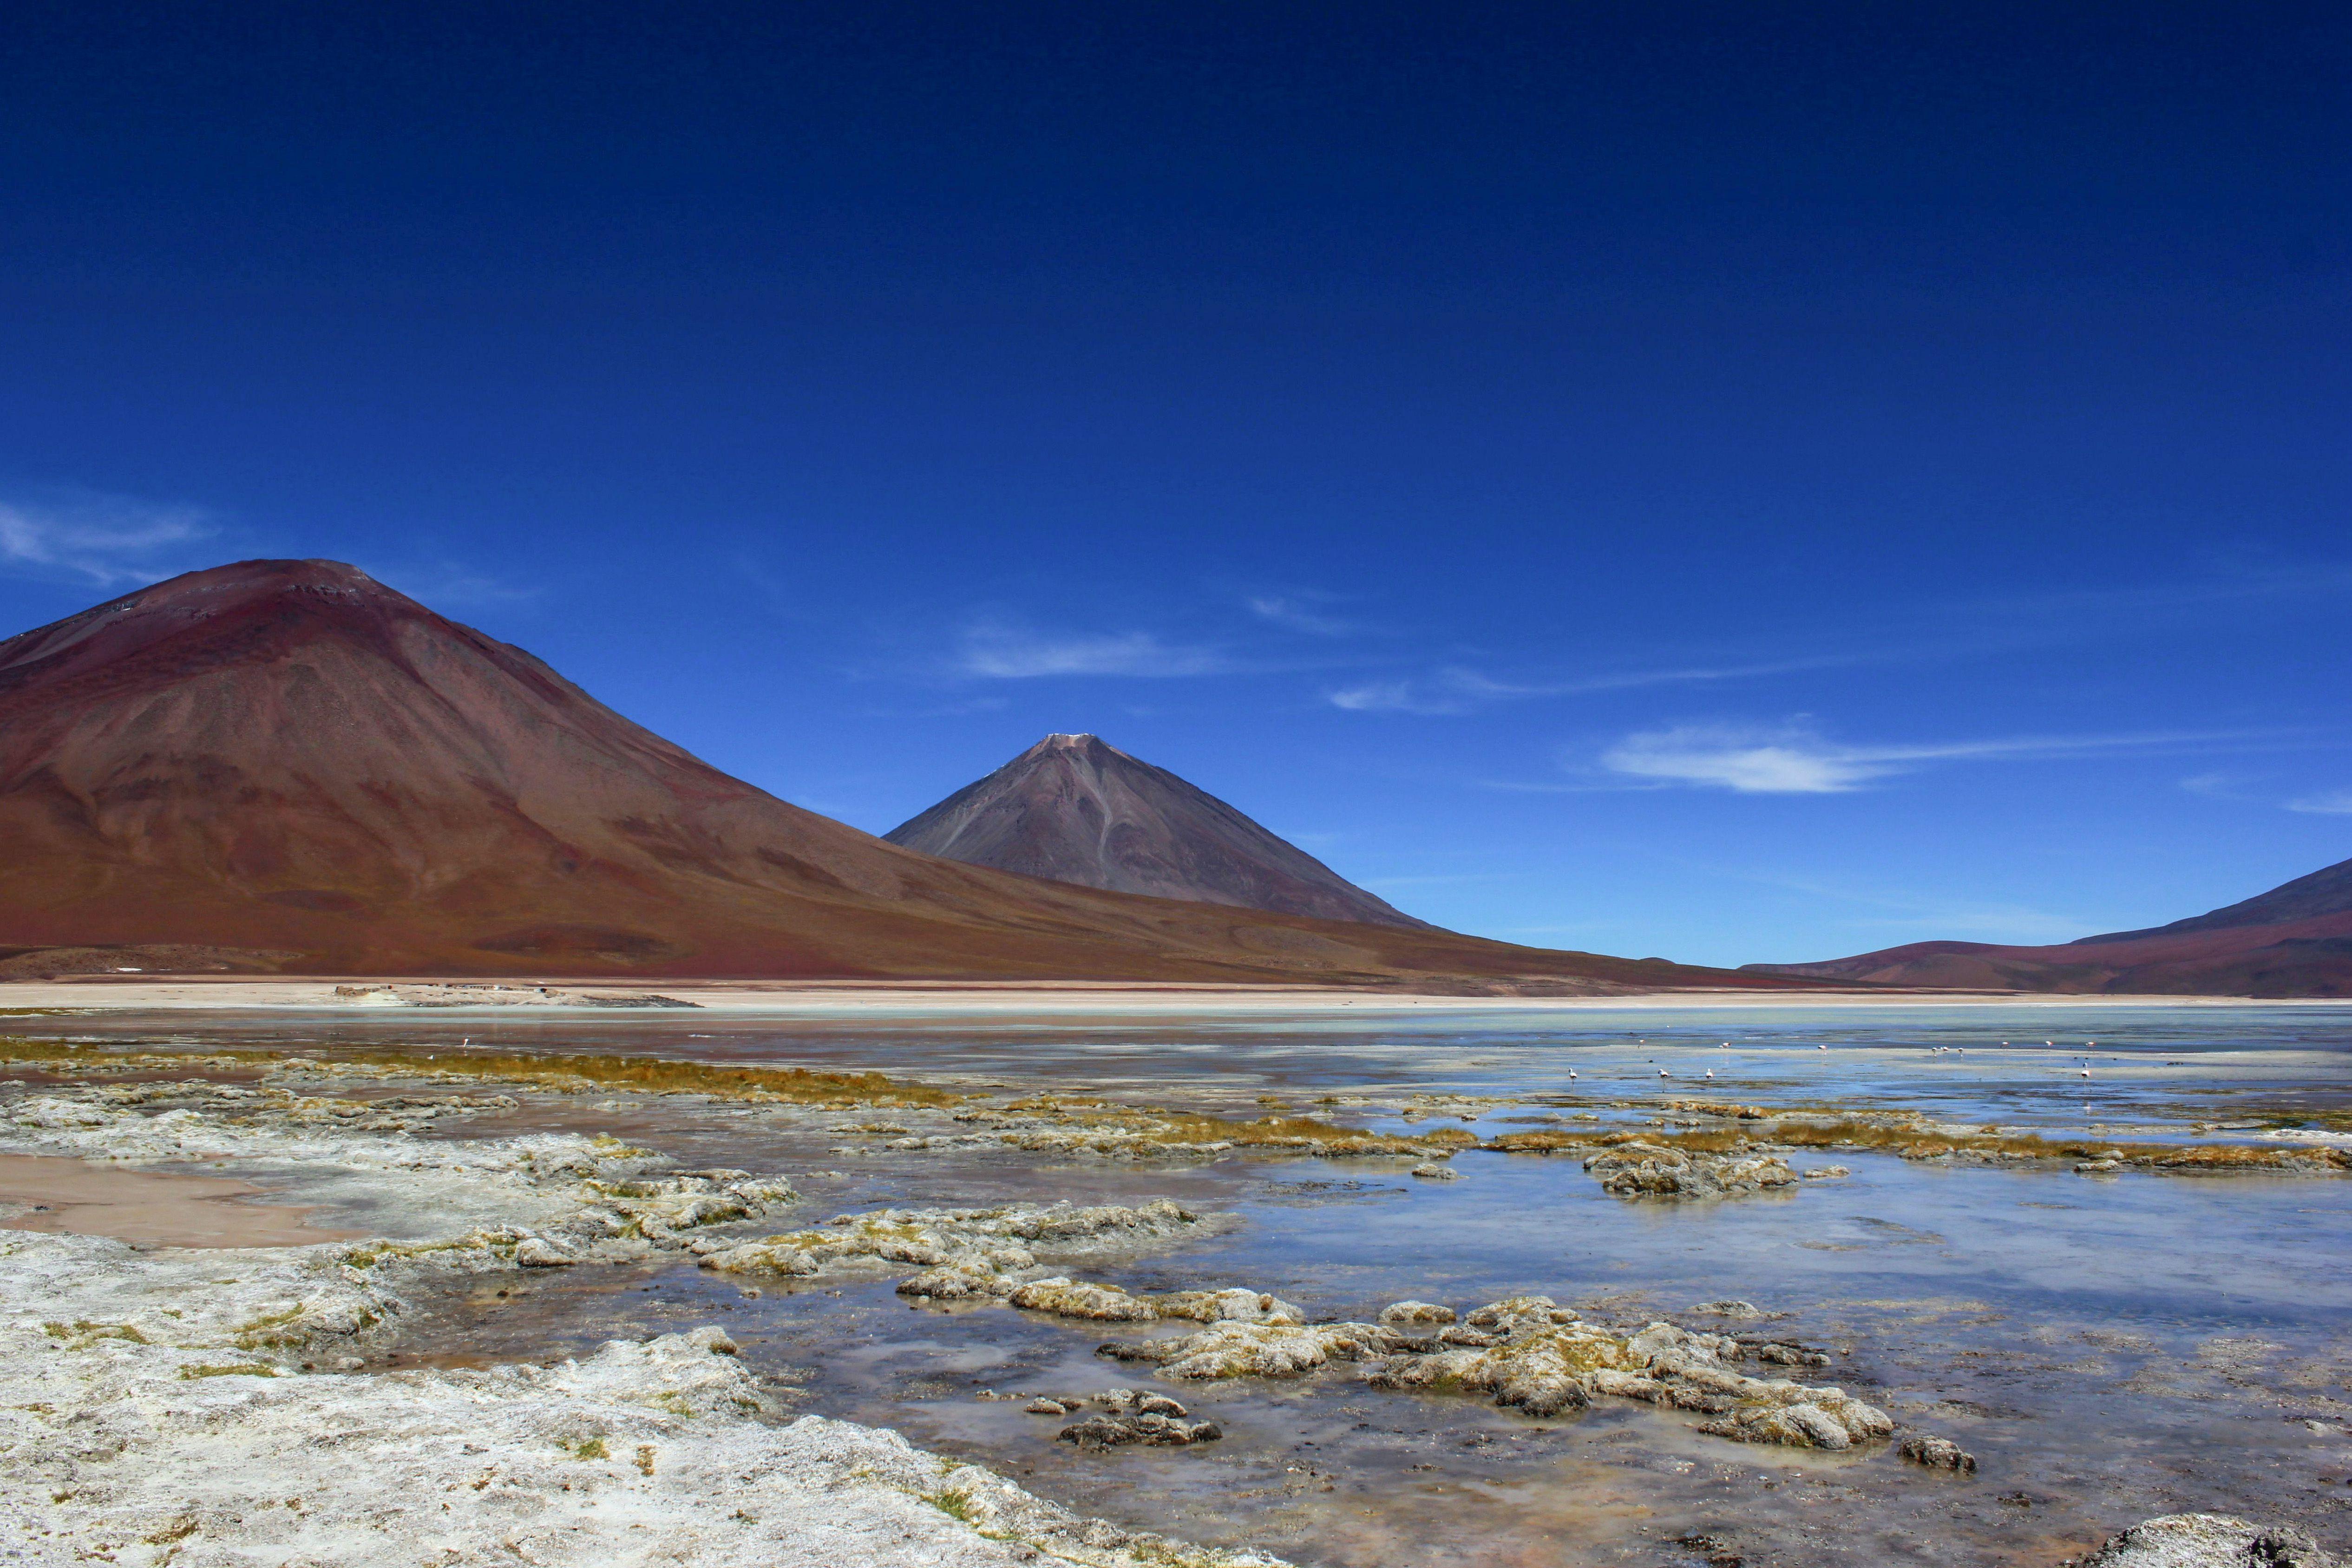 Scenic view of a lagoon in the Atacama dessert